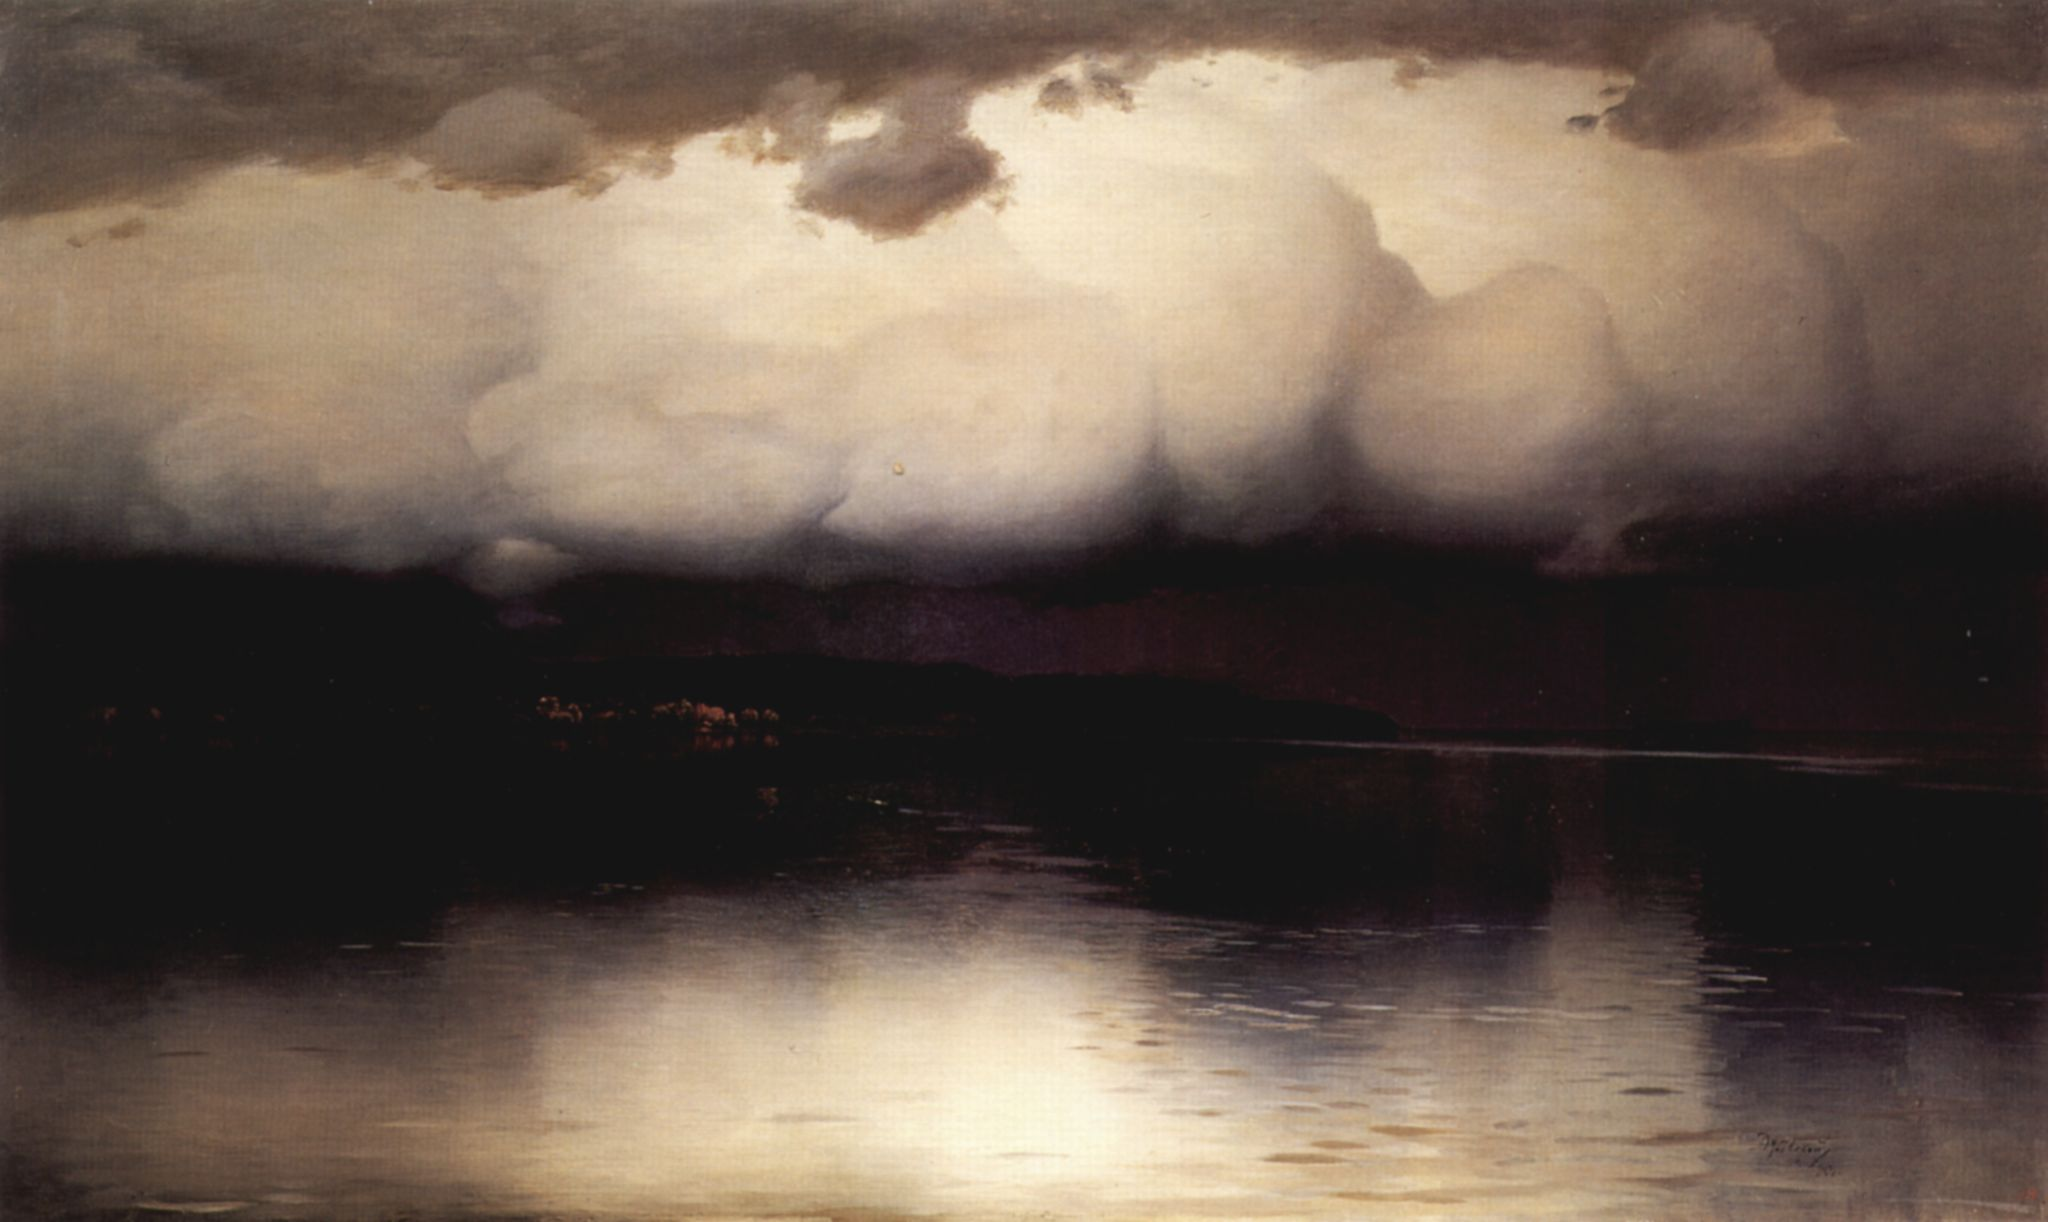 Штиль перед бурей, Дубовской Николай Никанорович